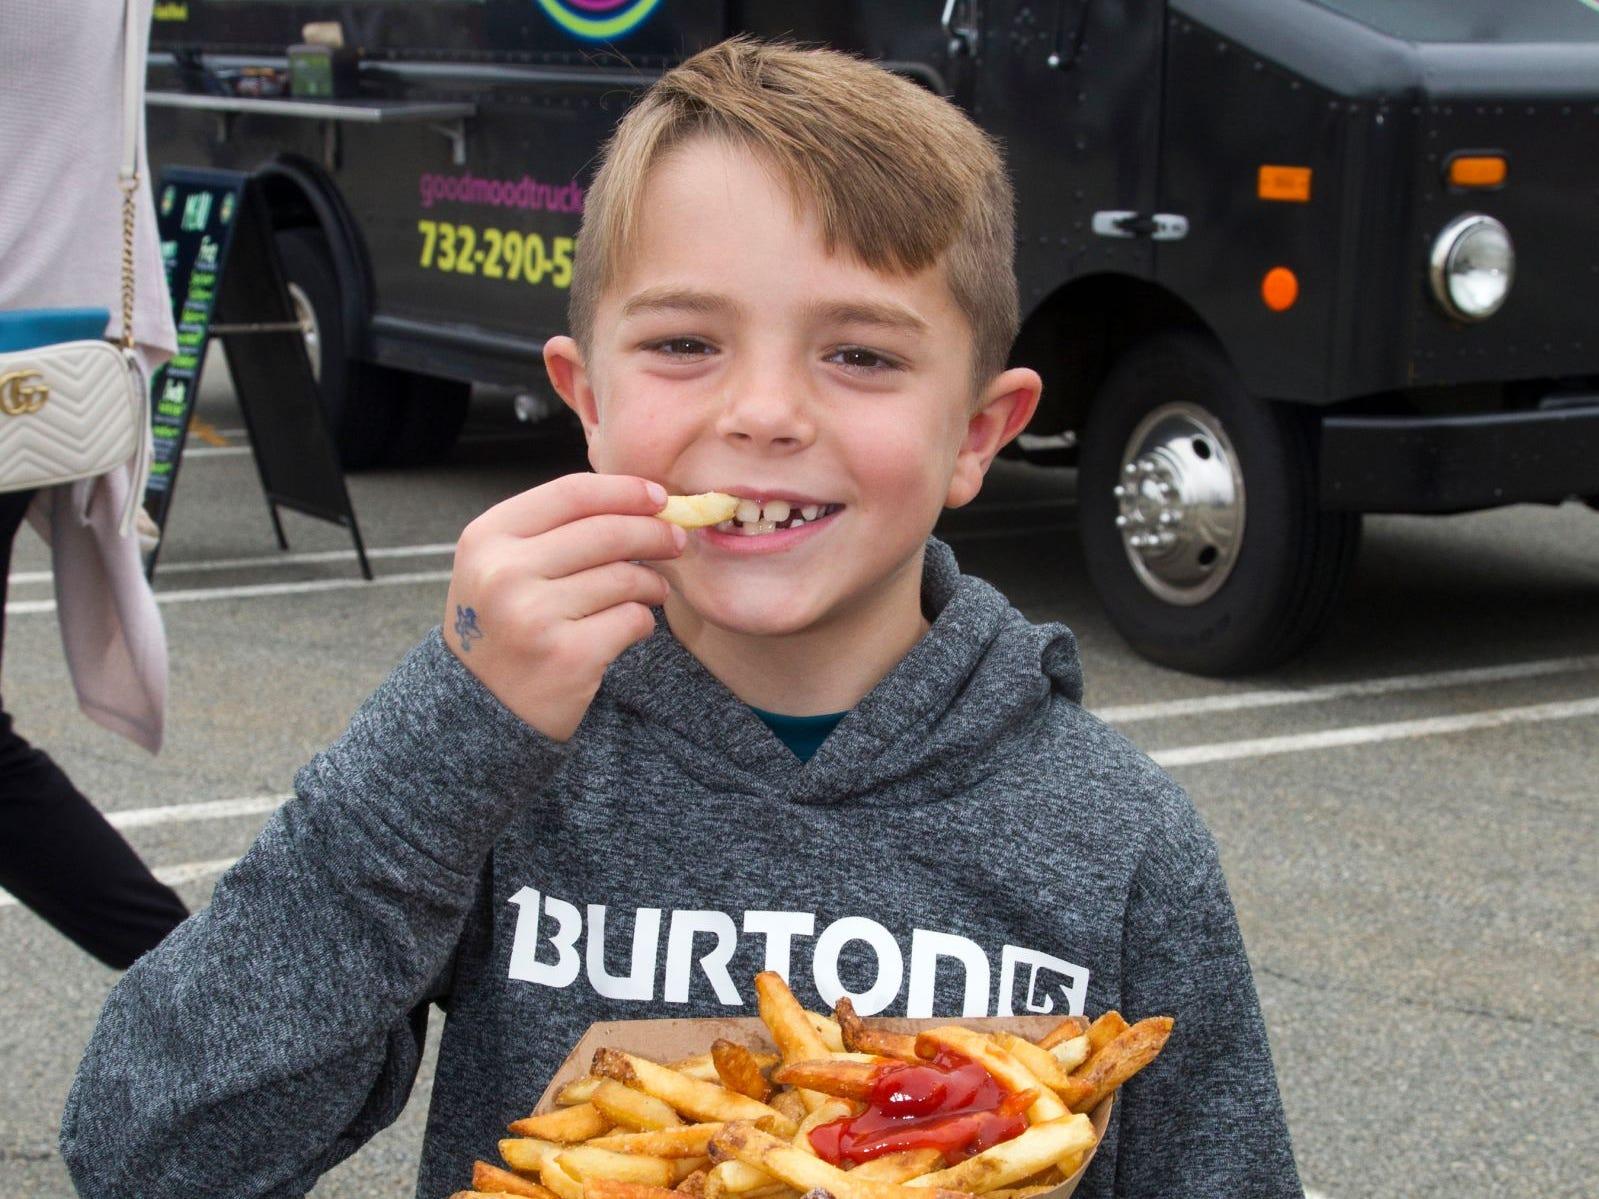 Chase of Wayne. Paramus Food Truck Festival at Westfeld Garden State Plaza. 08/19/2018